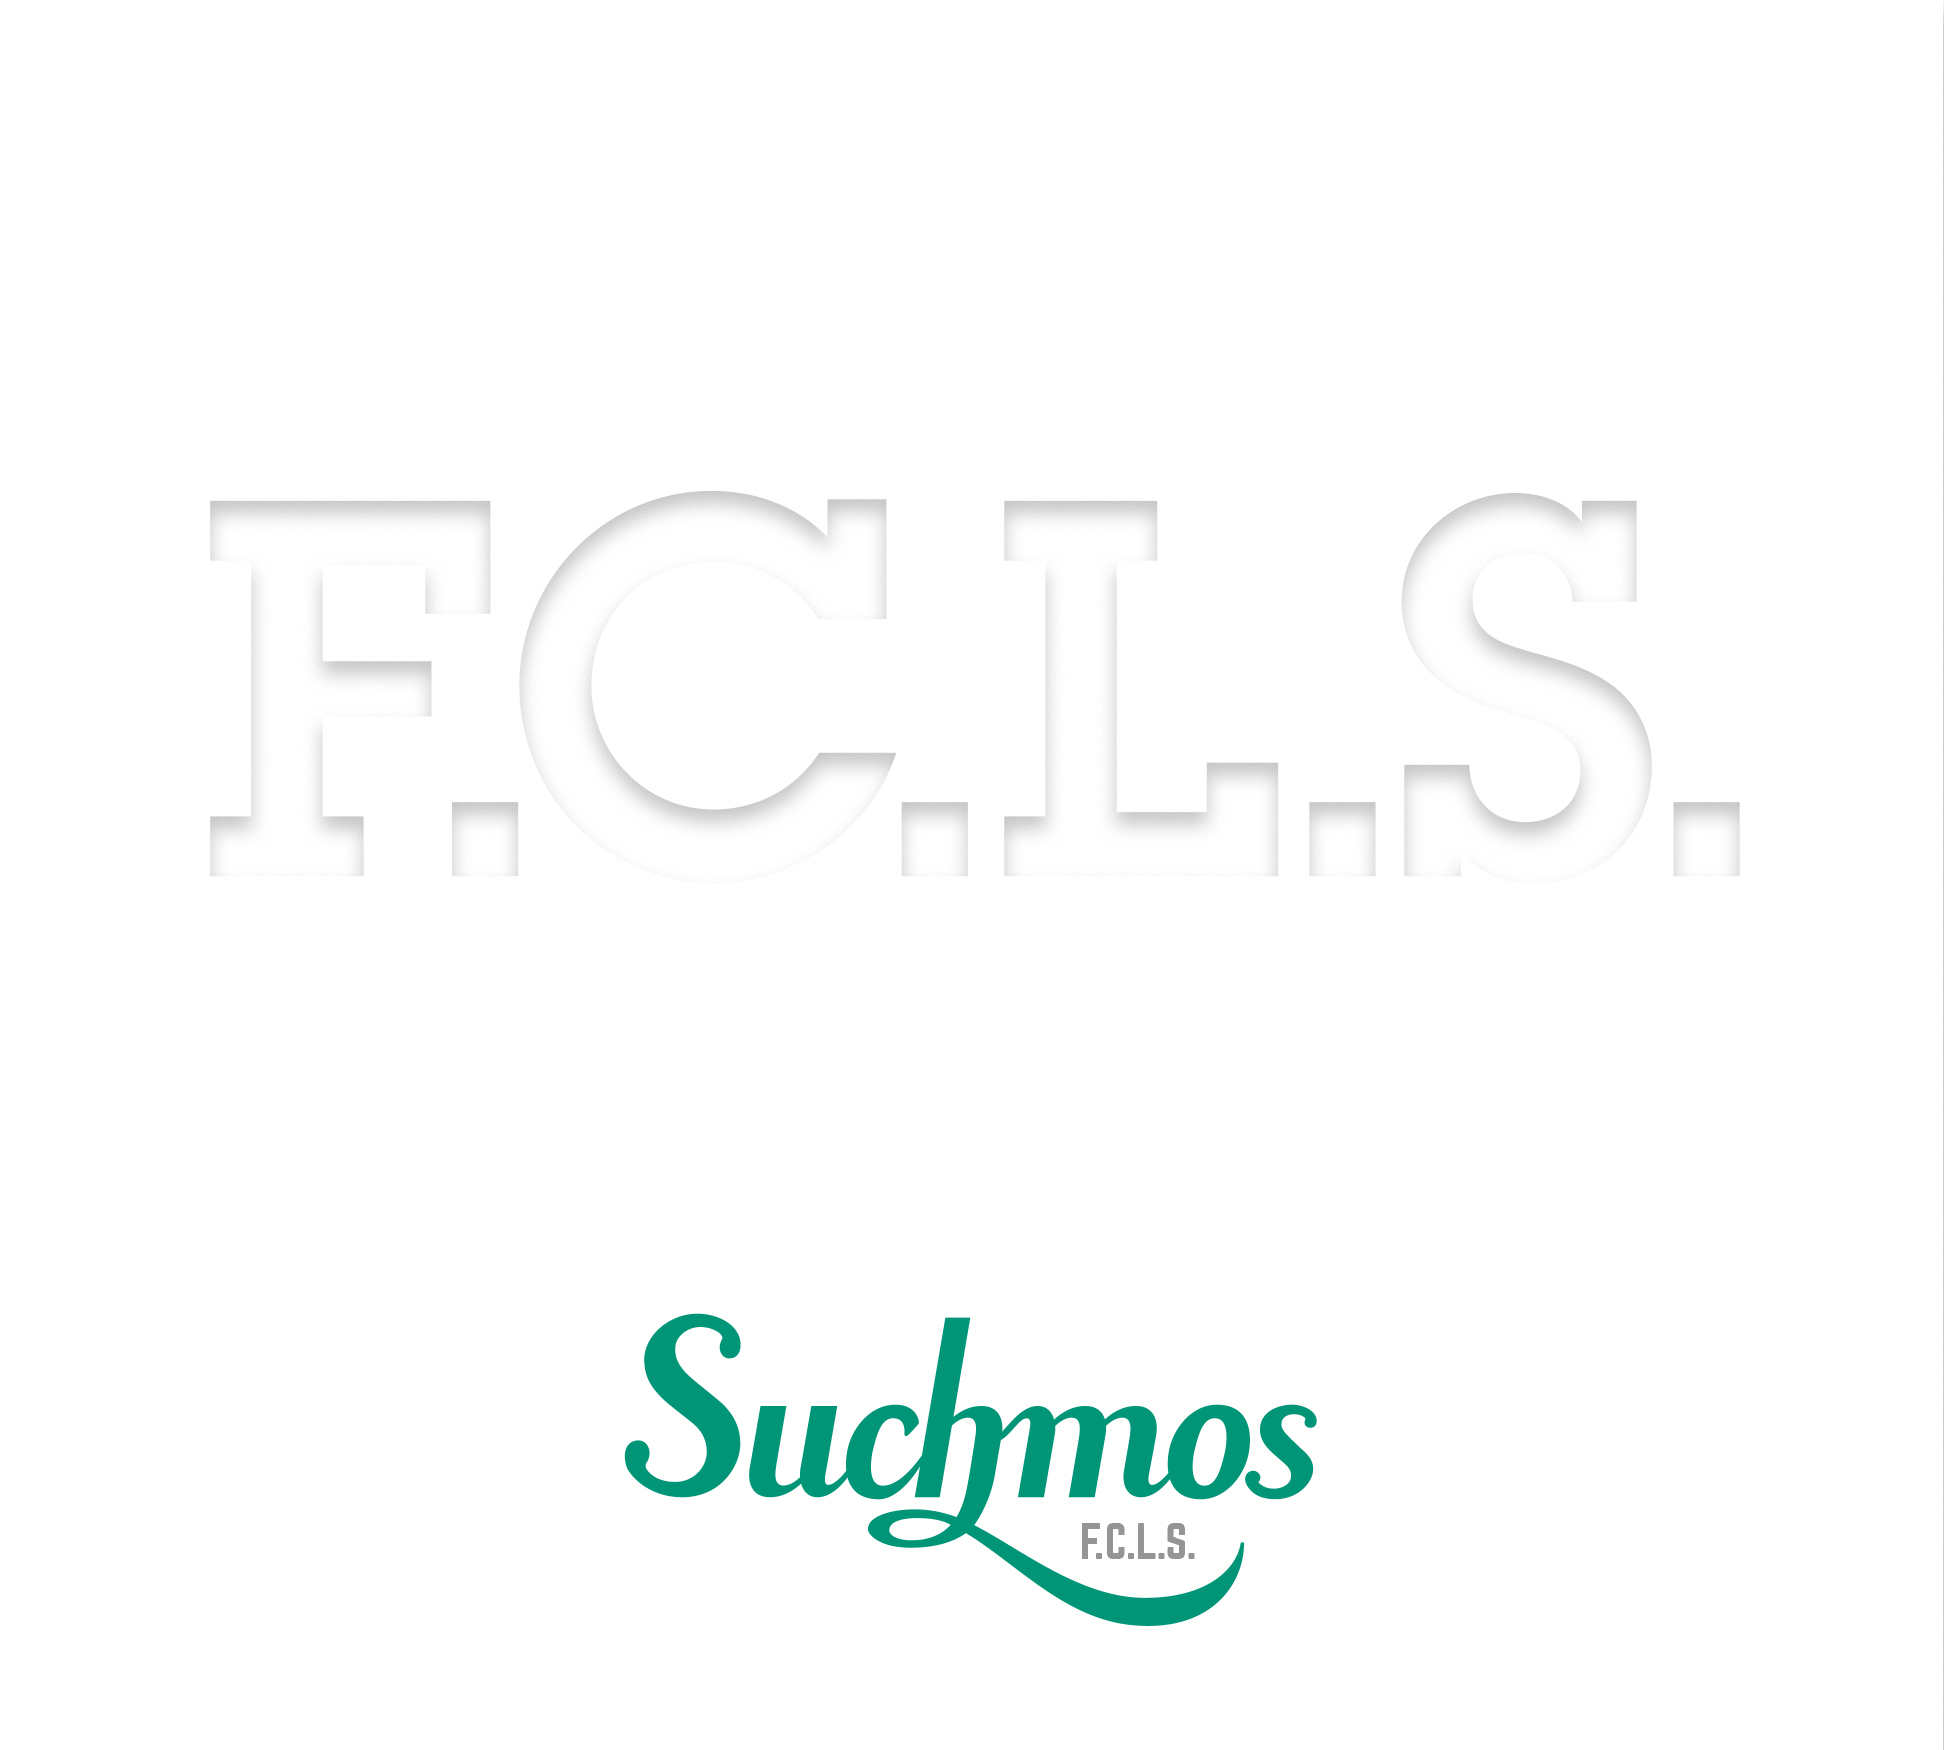 Suchmos『FIRST CHOICE LAST STANCE』【初回仕様限定盤】ストリート仕様